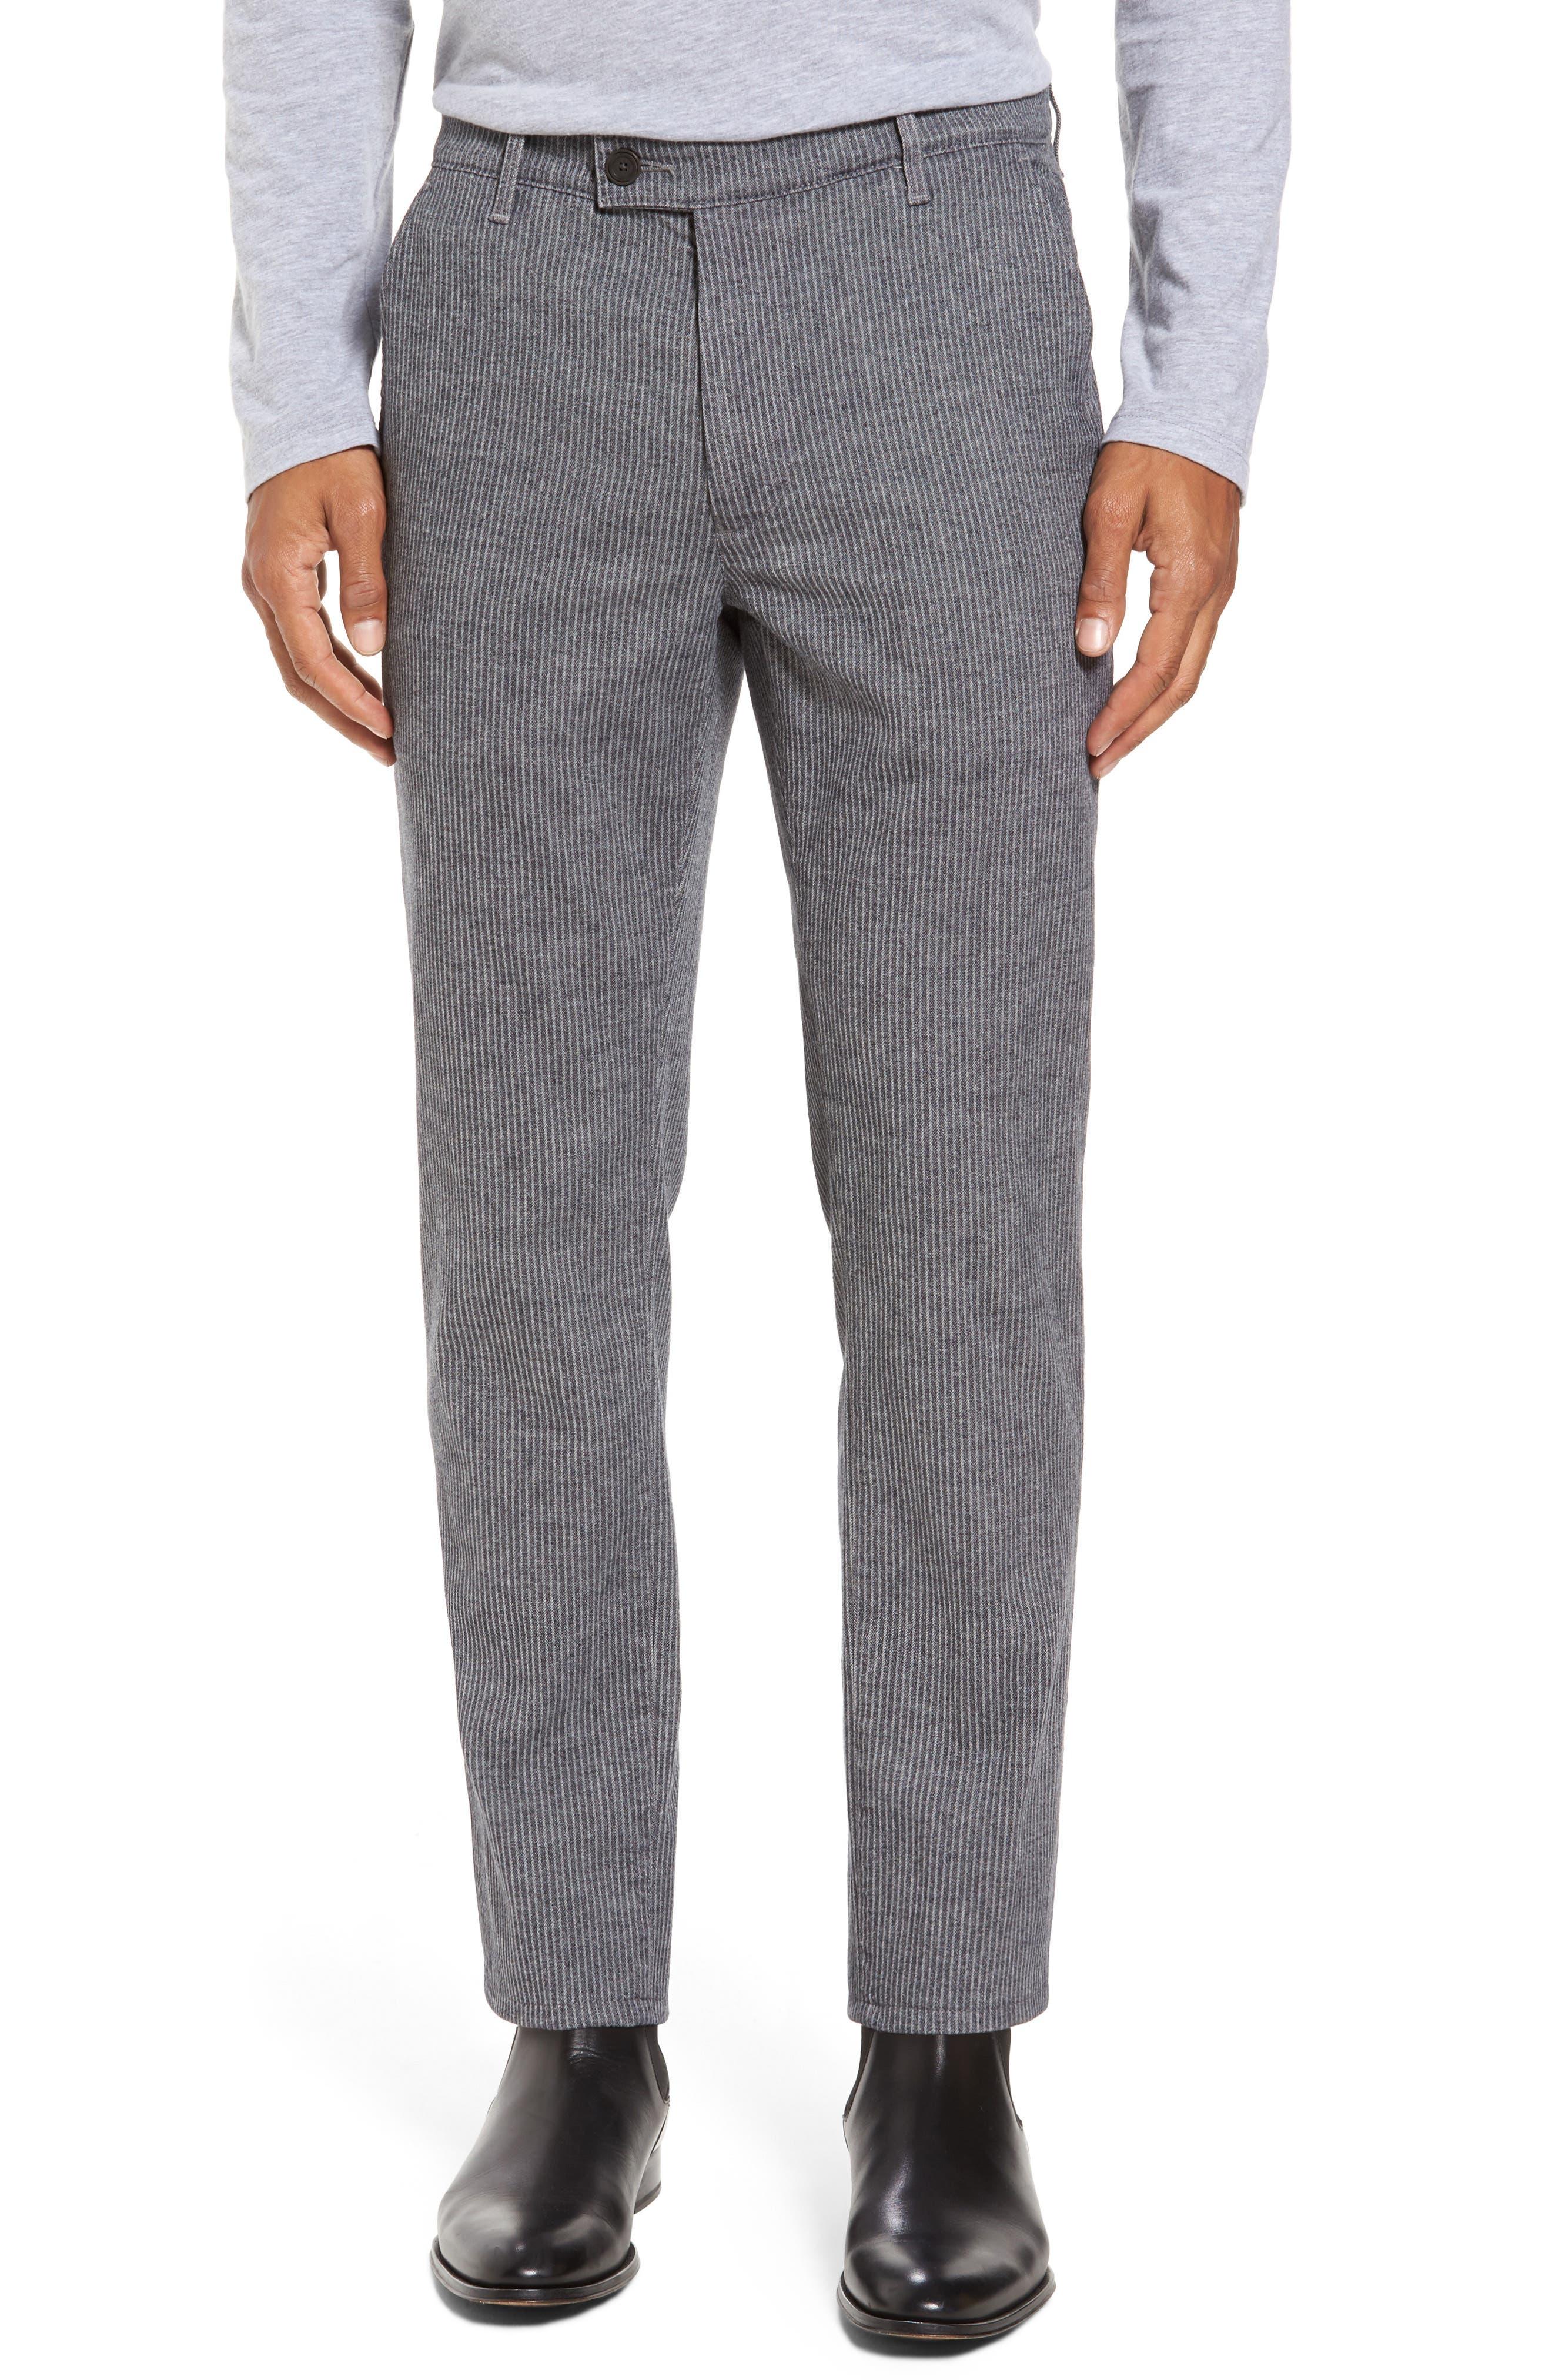 Marshall Slim Fit Pinstripe Pants,                             Main thumbnail 1, color,                             028